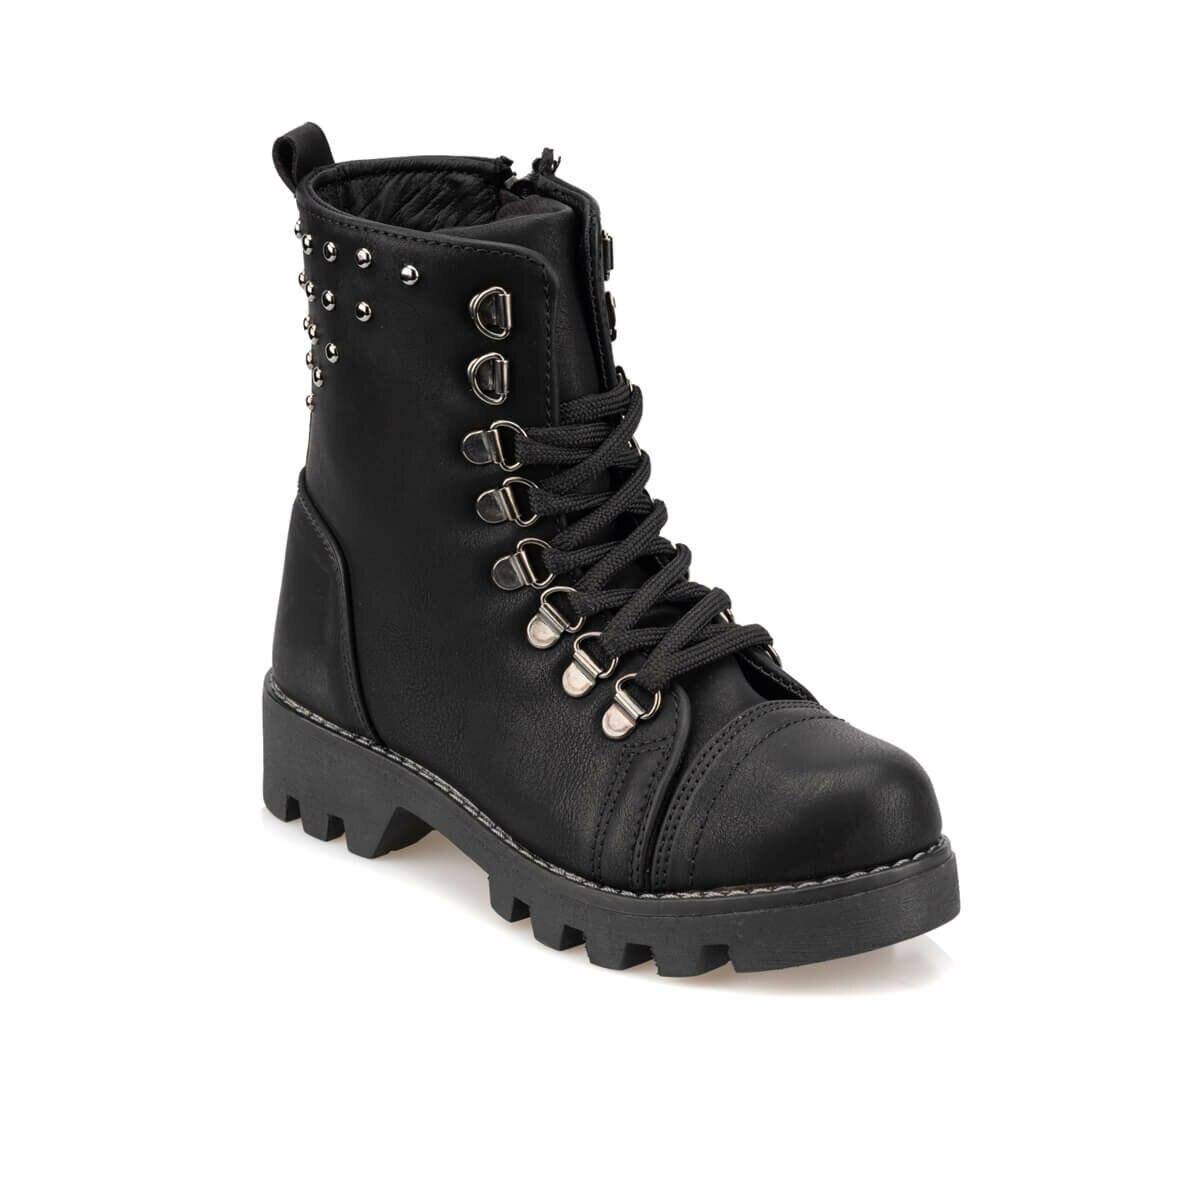 FLO 92.511820.F Black Female Child Boots Polaris